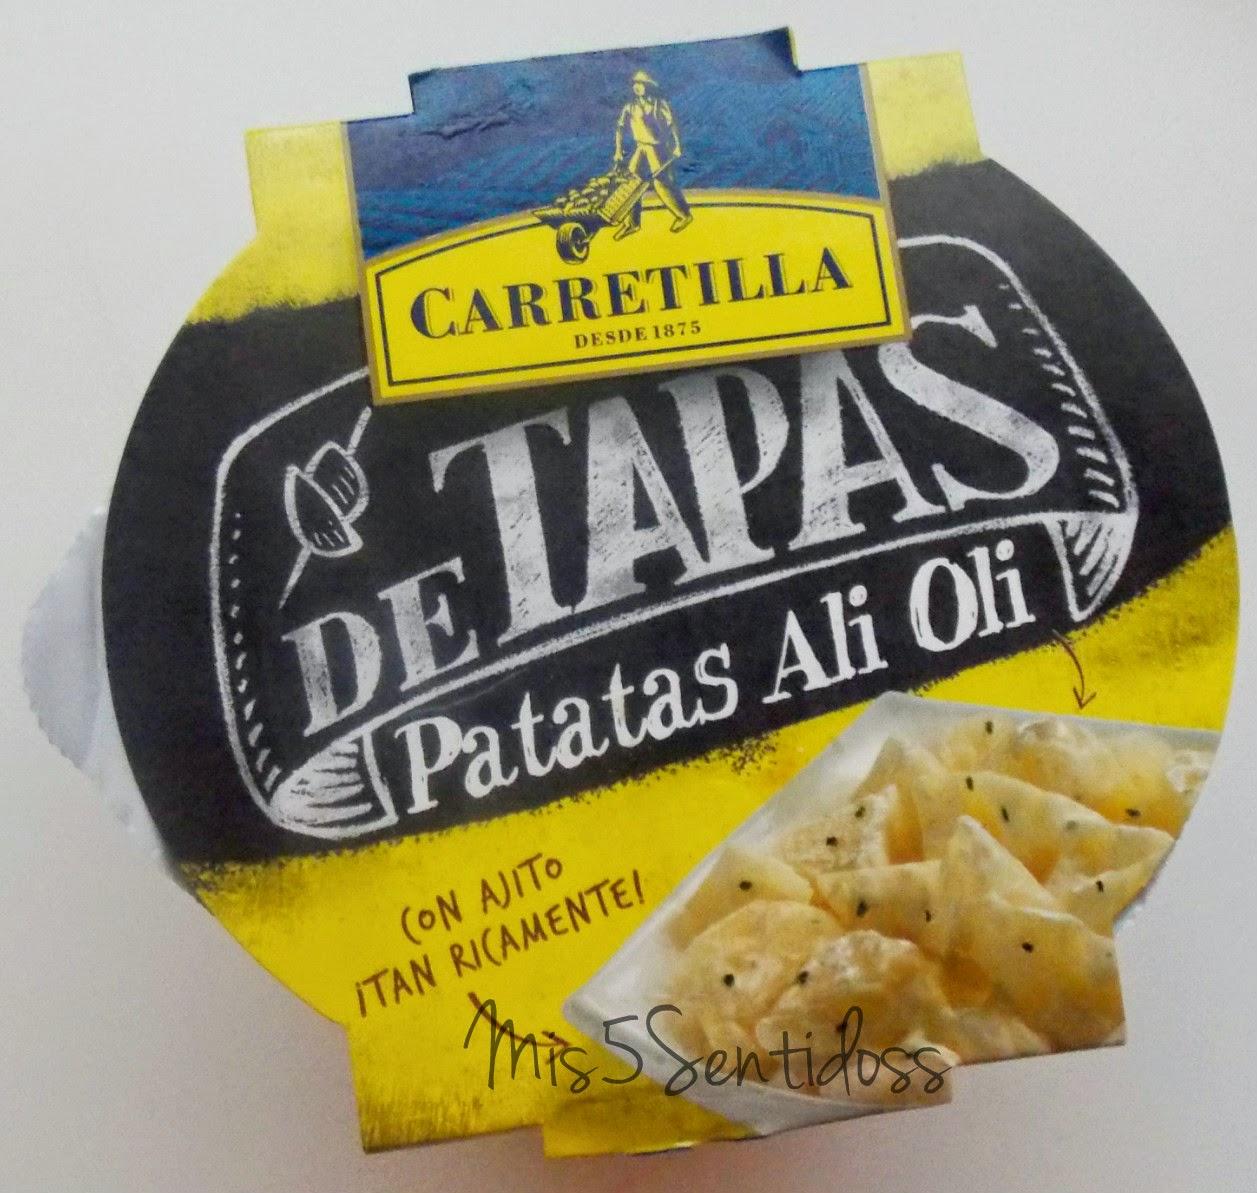 Carretilla patatas ali oli